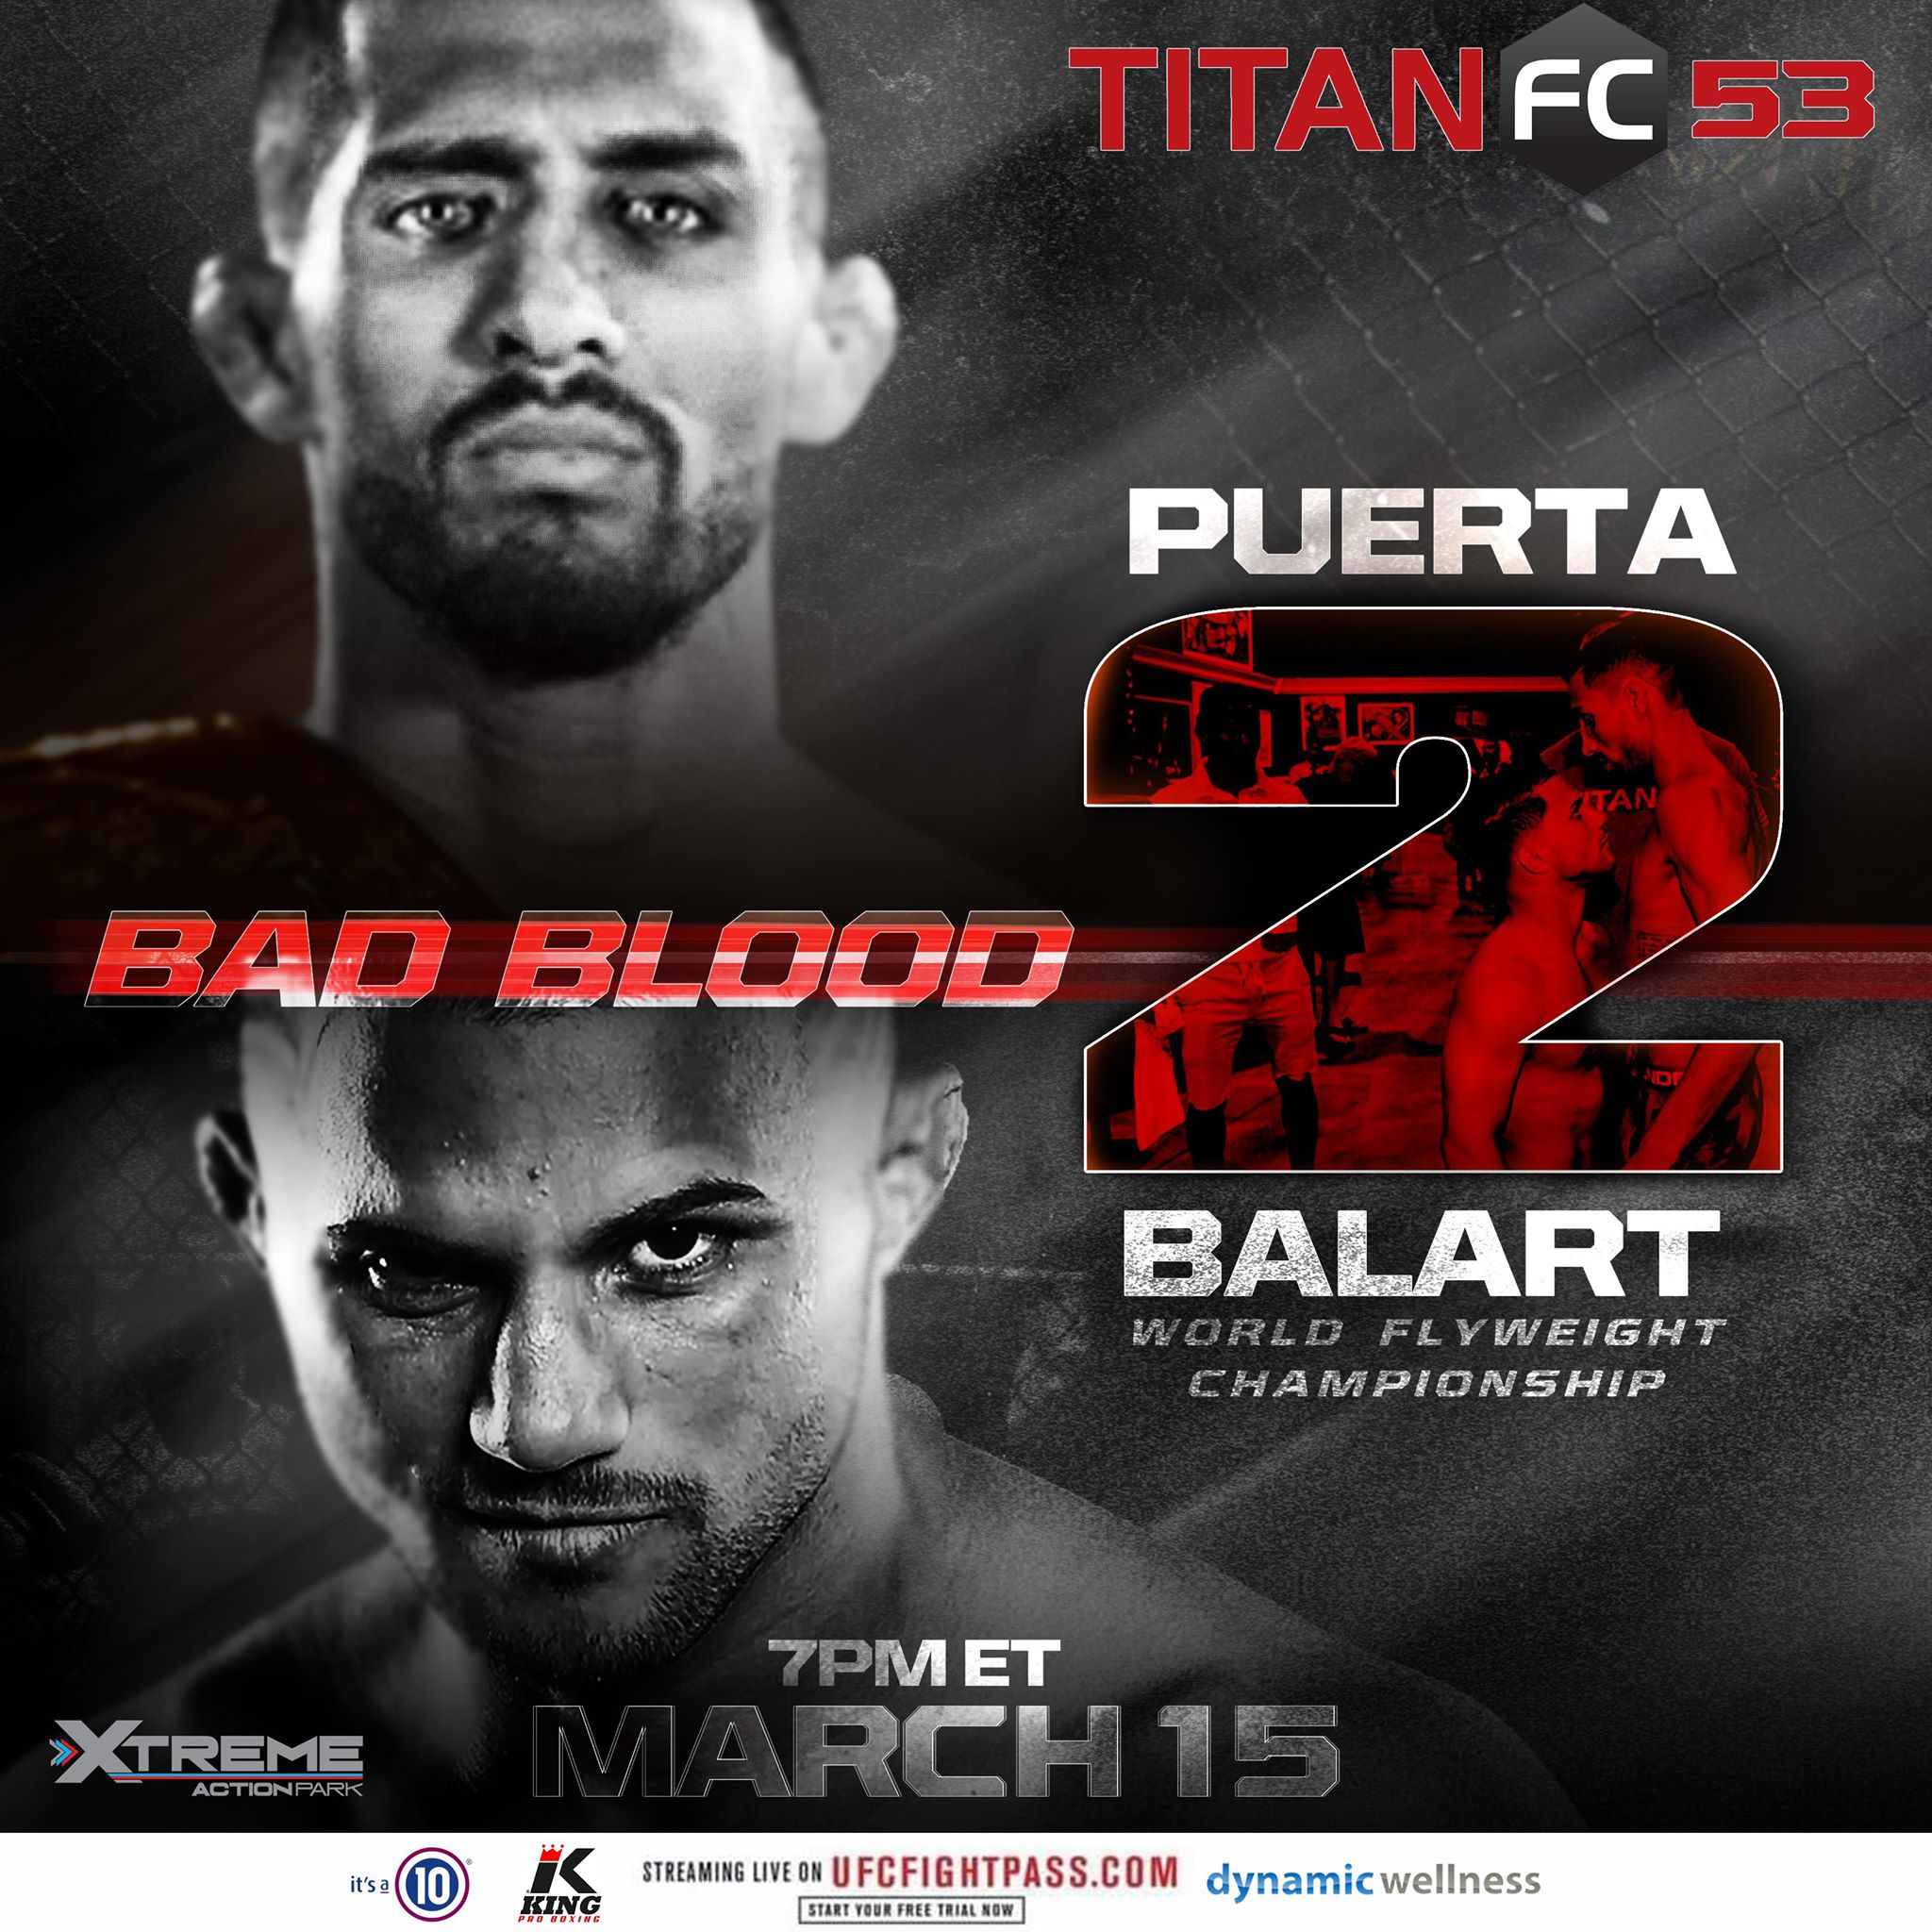 Titan FC 53, Juan Puerta, Gustavo Balart